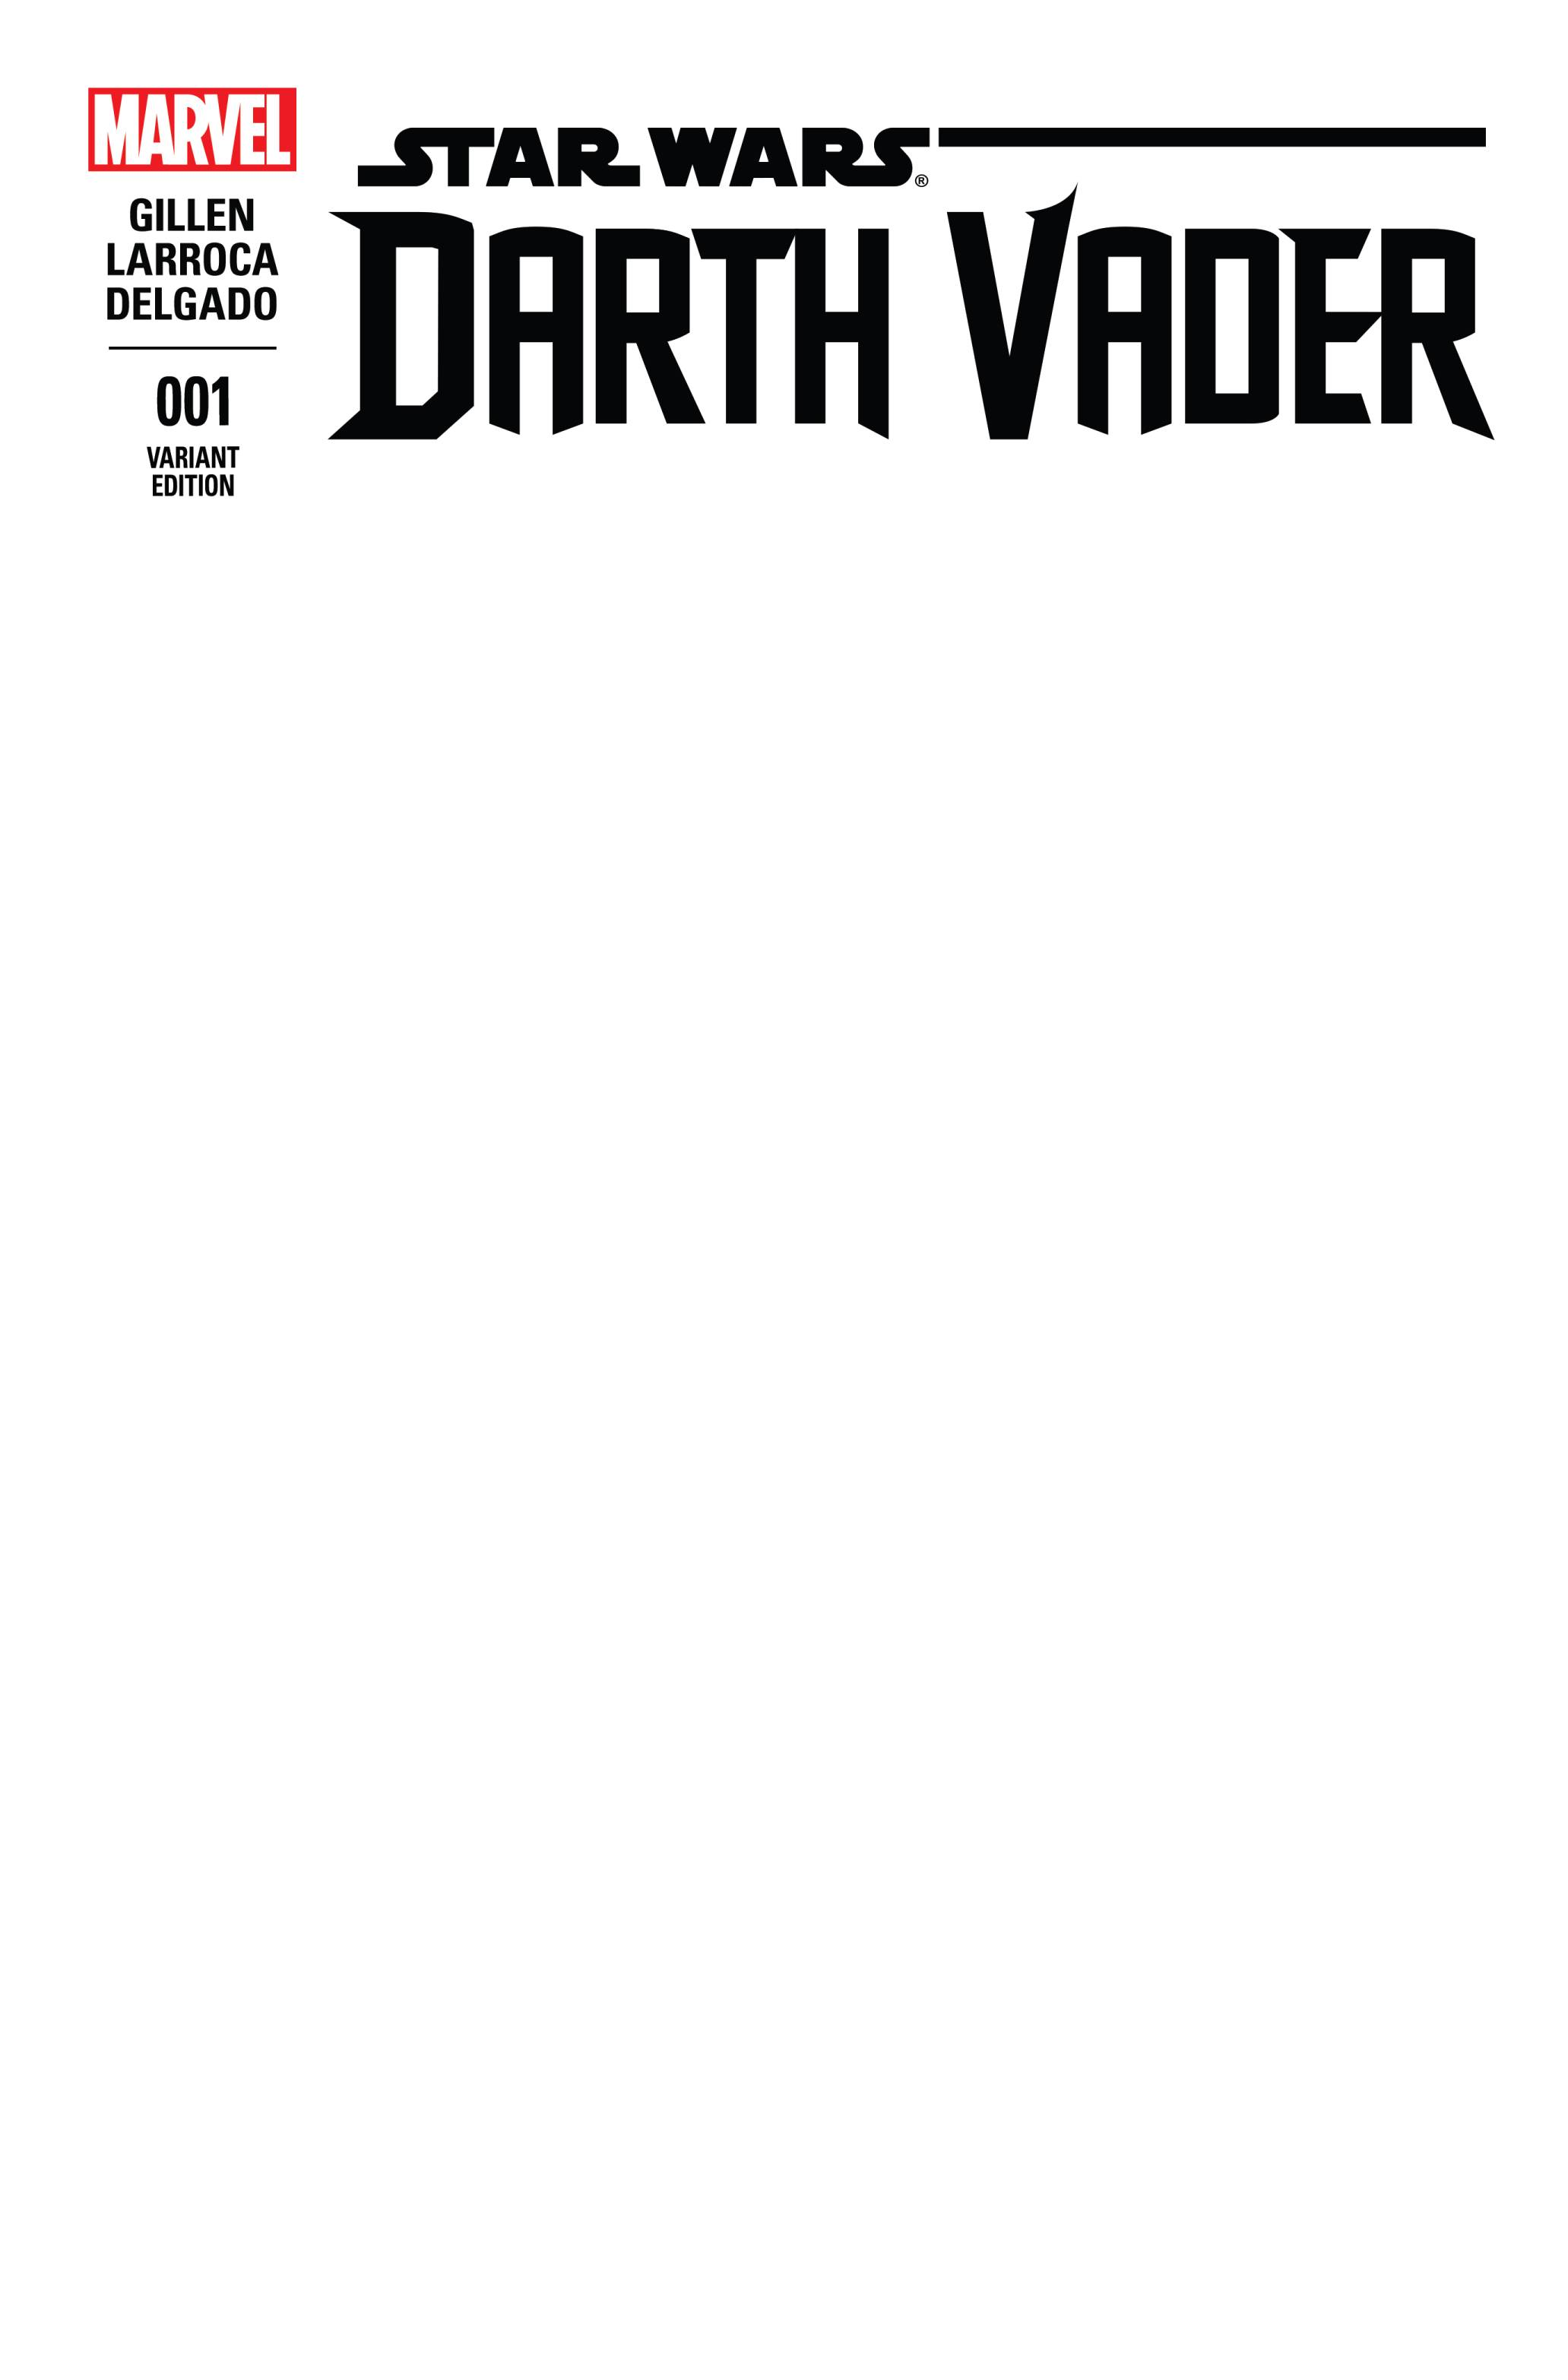 Darth Vader #1 (Blank Variant Cover) (11.02.2015)